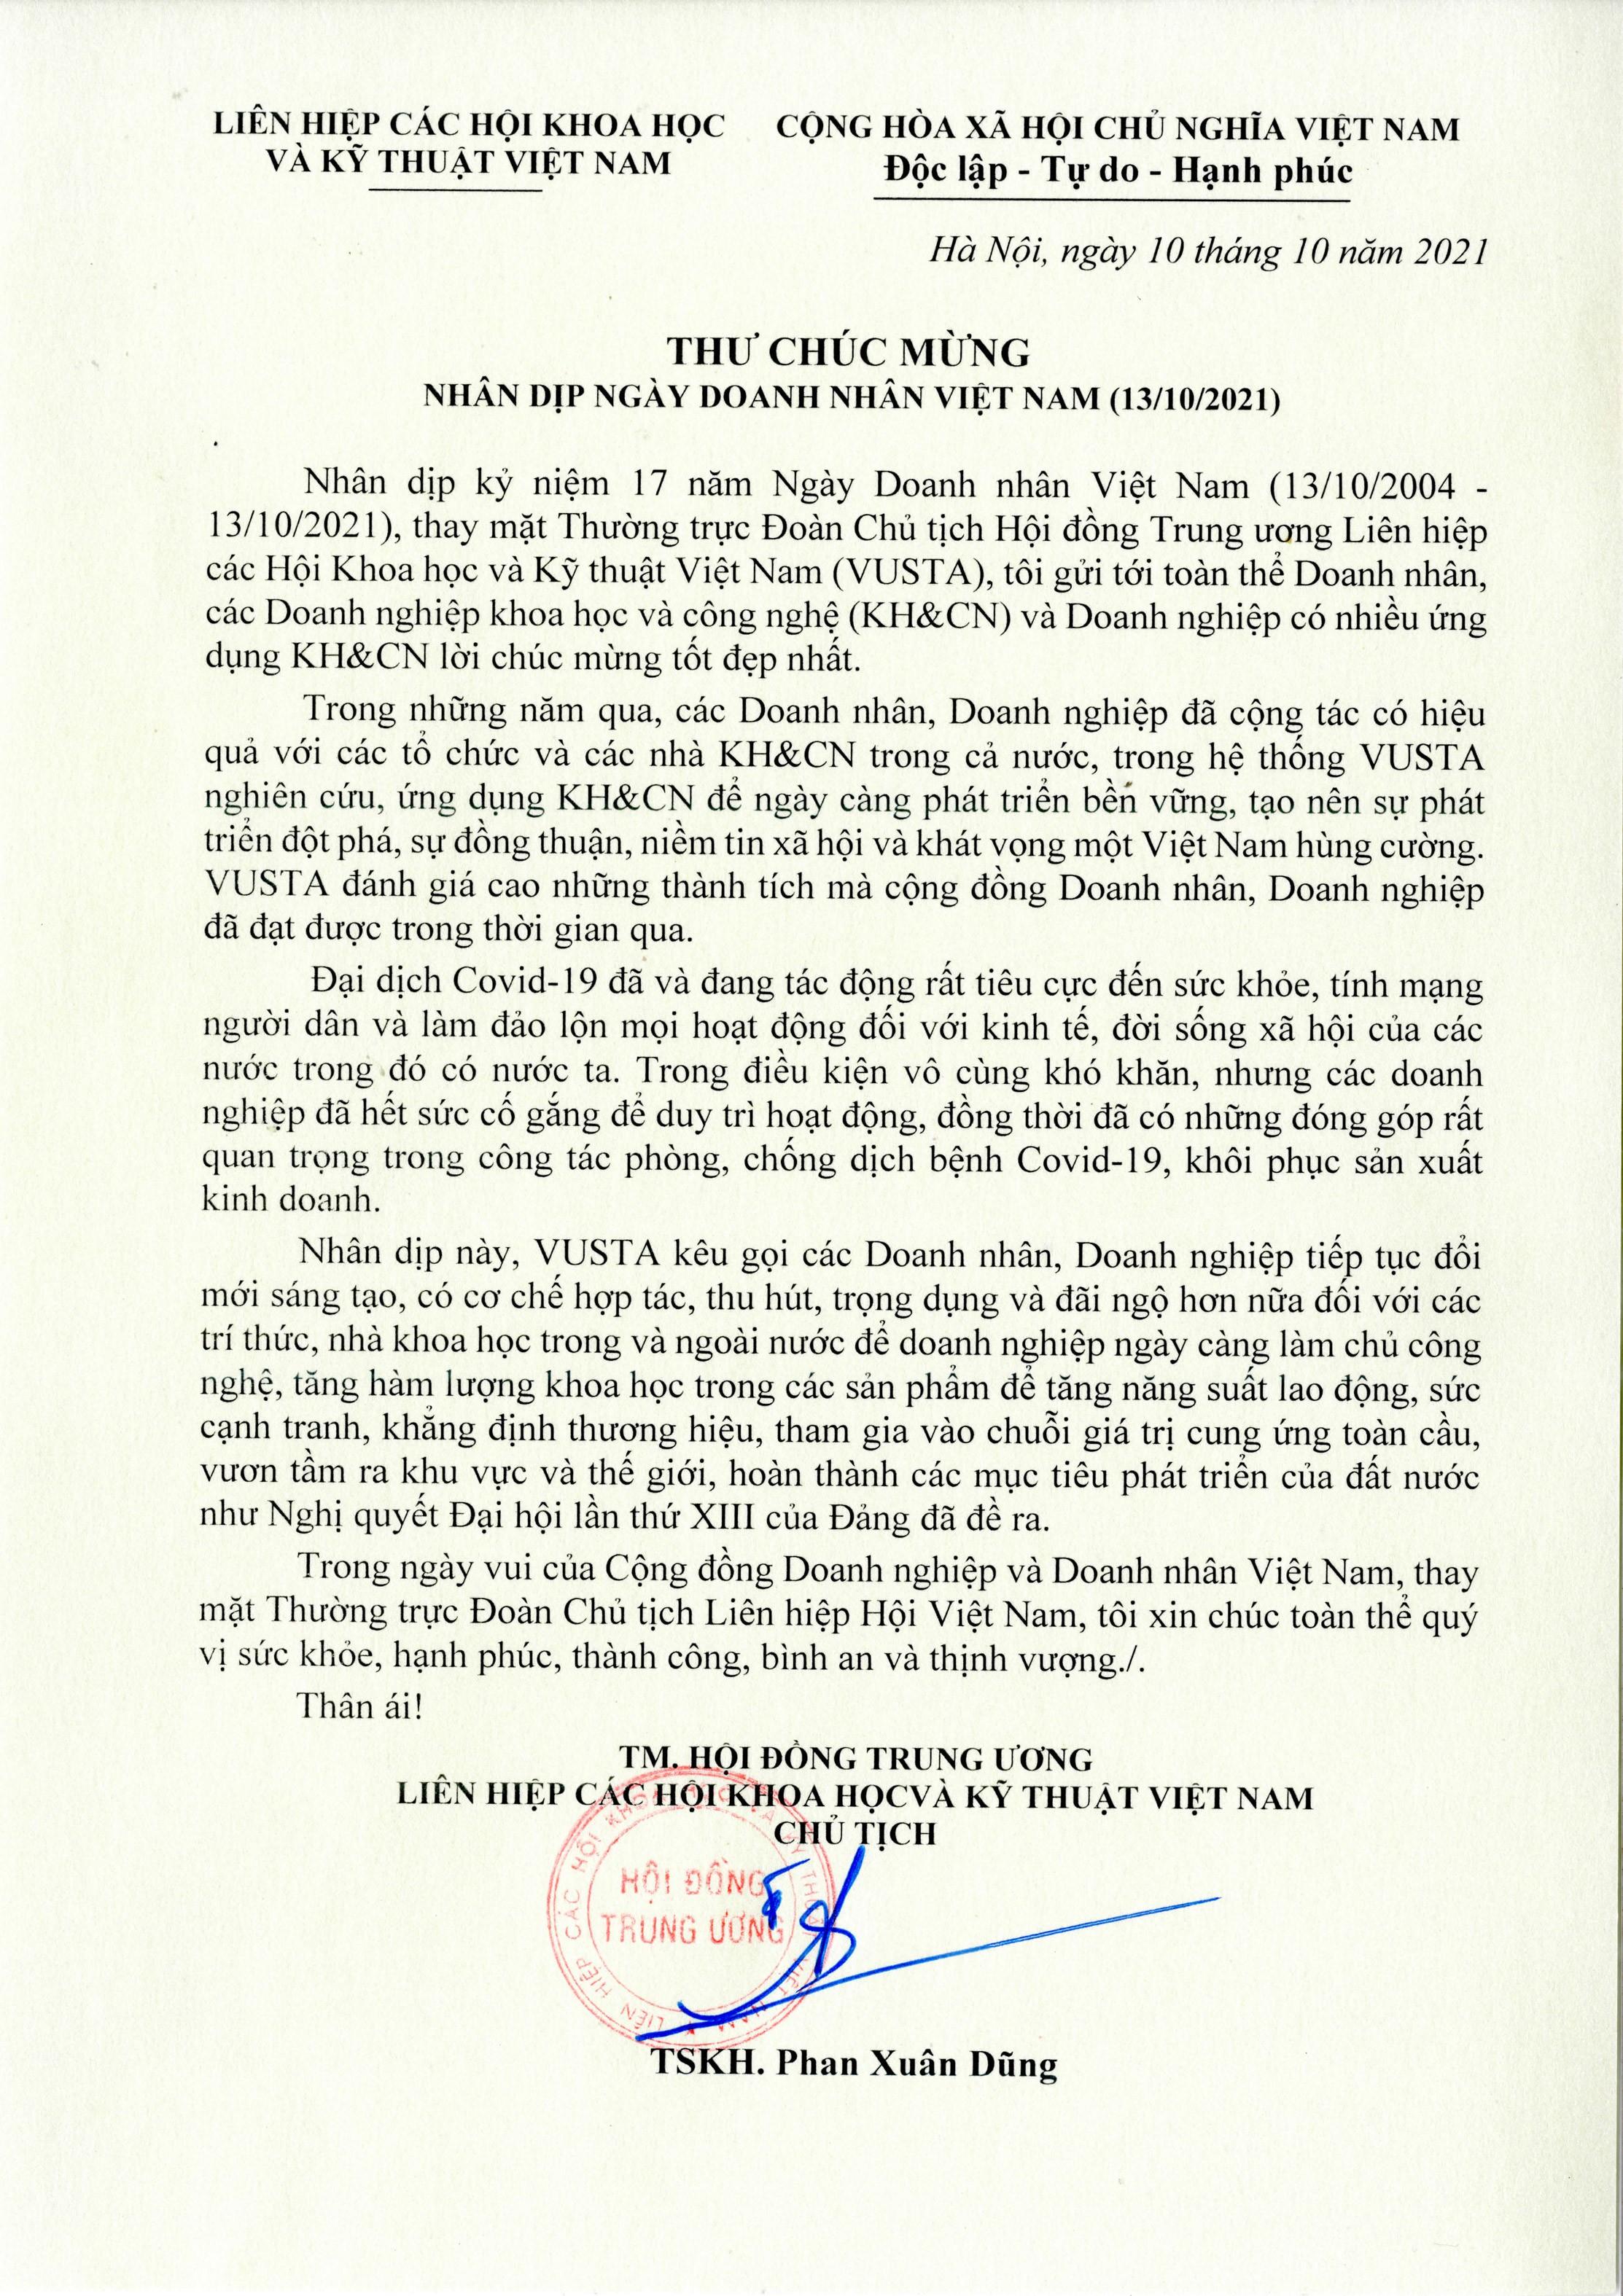 e-Magazine: Chu tich VUSTA Phan Xuan Dung gui thu chuc mung ngay Doanh nhan Viet Nam